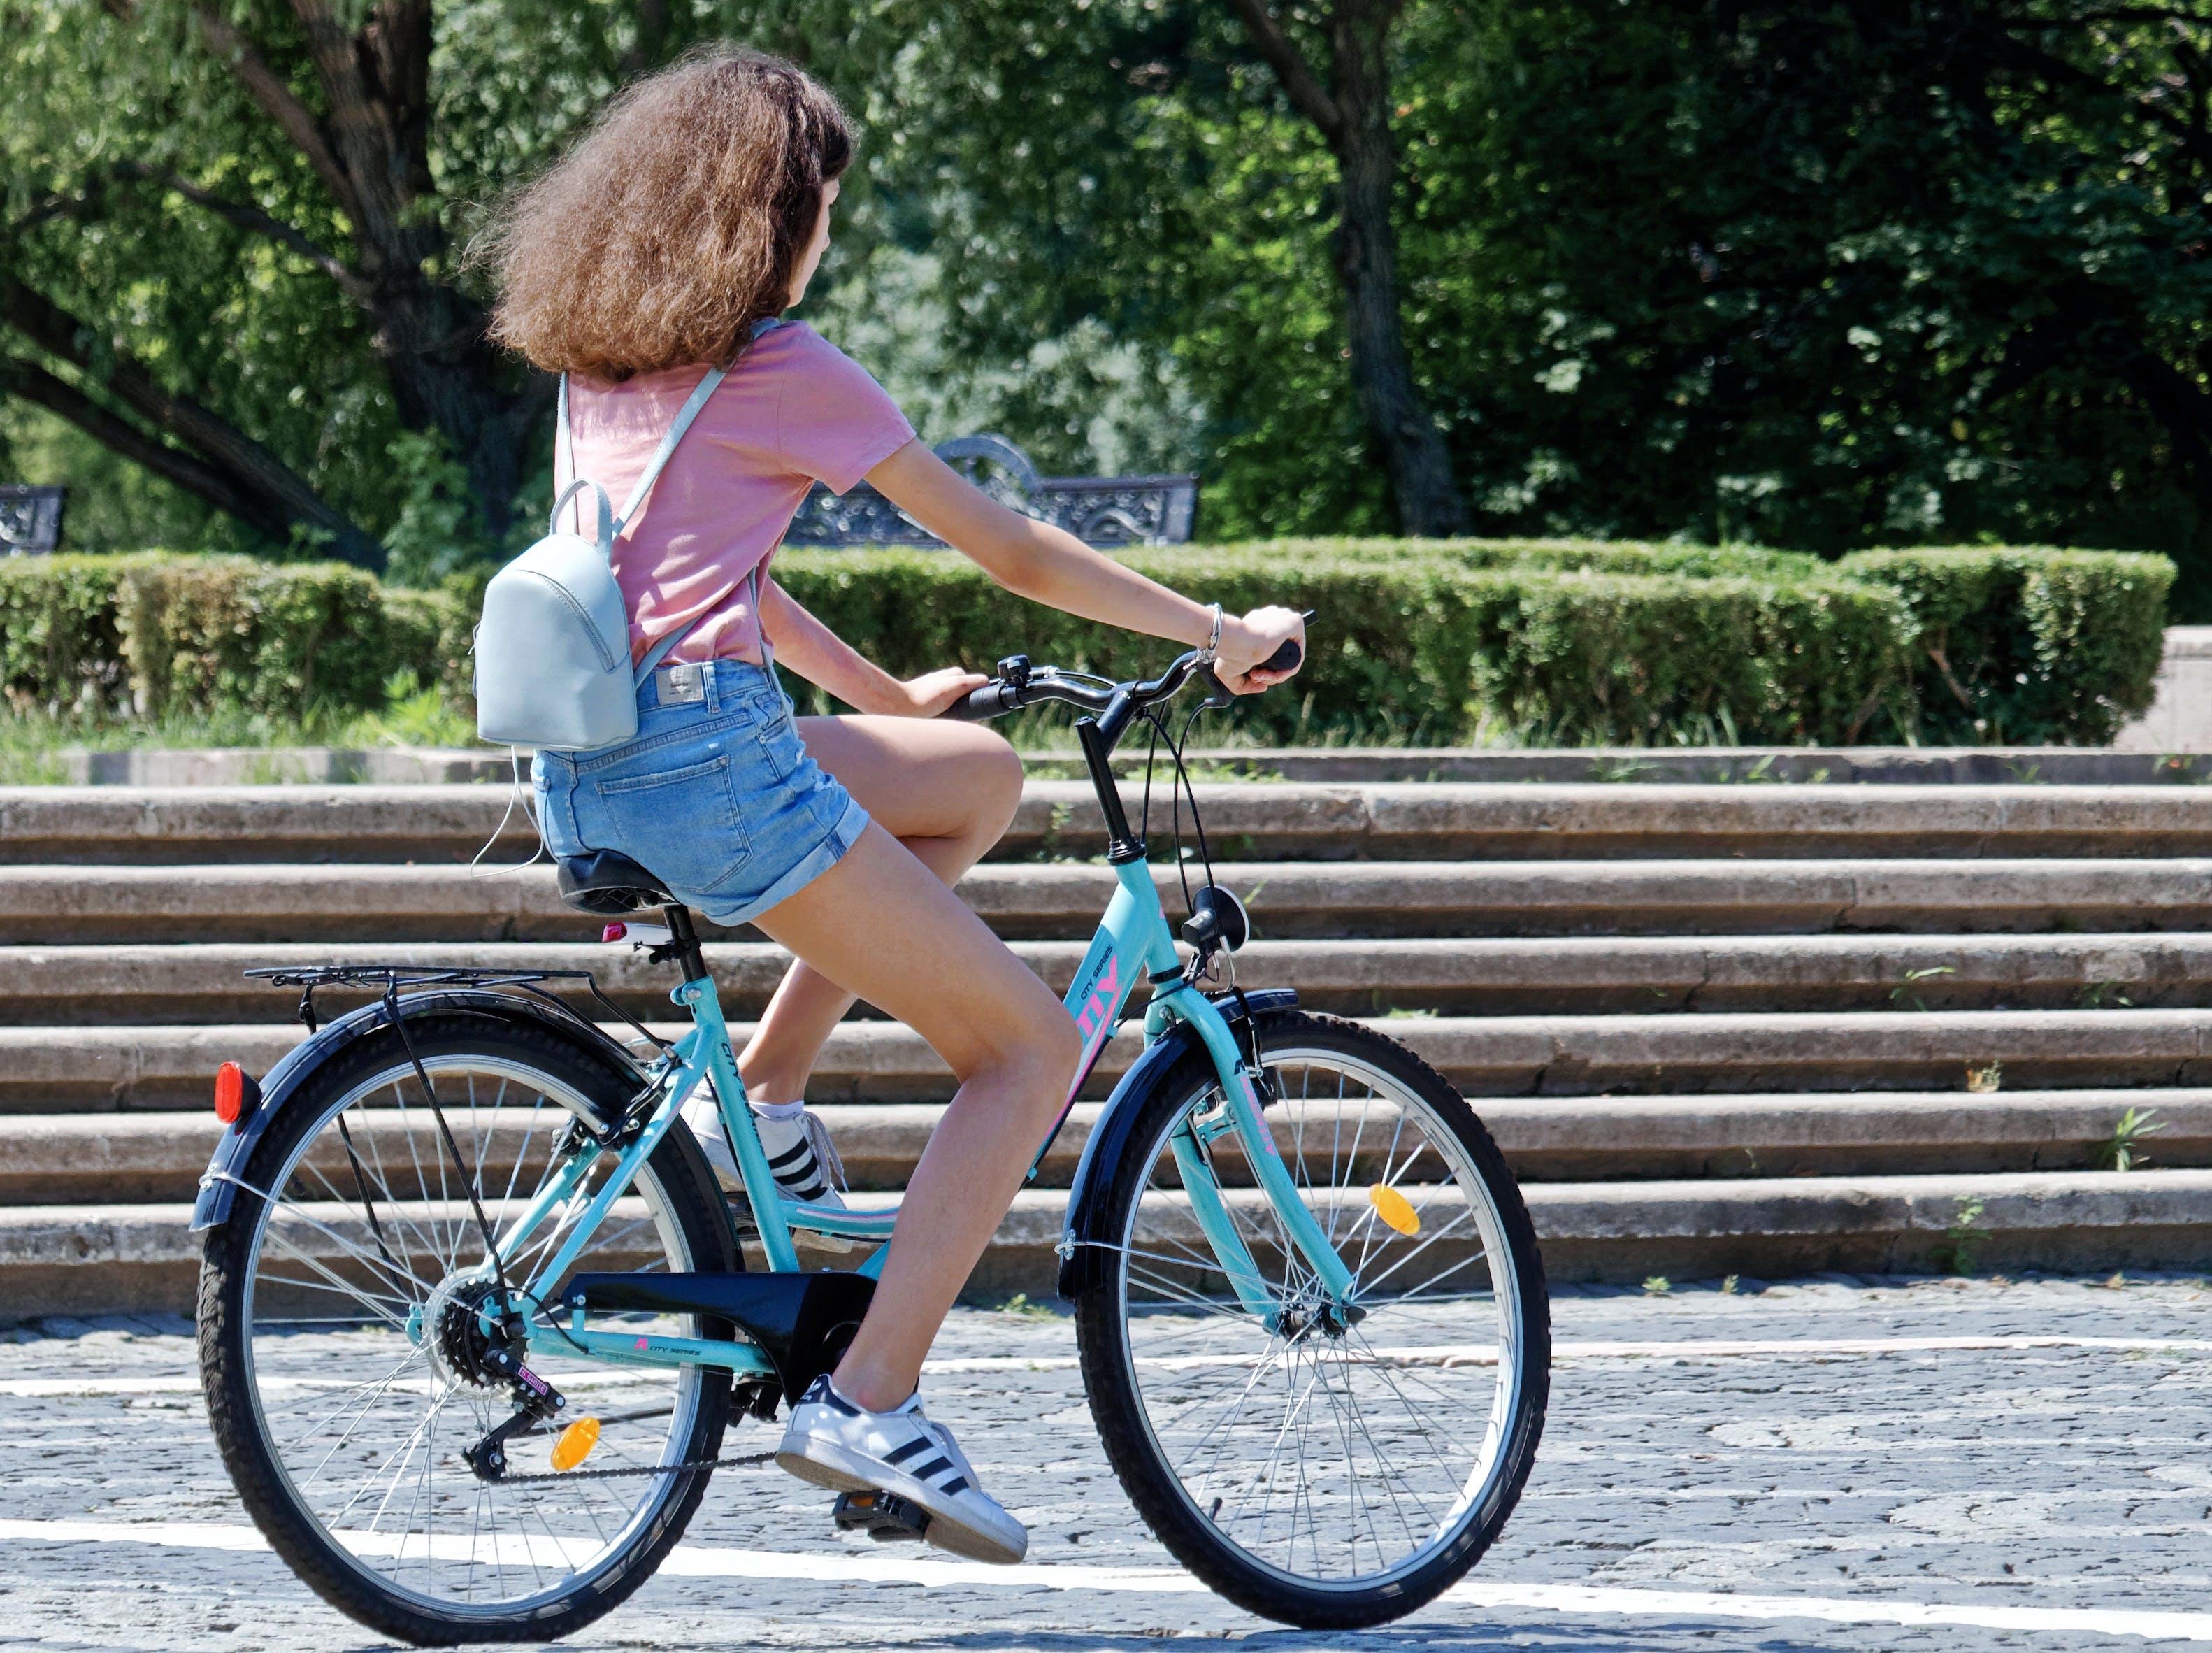 Gratis lagerfoto af aktiv, cykel, cykling, dagslys